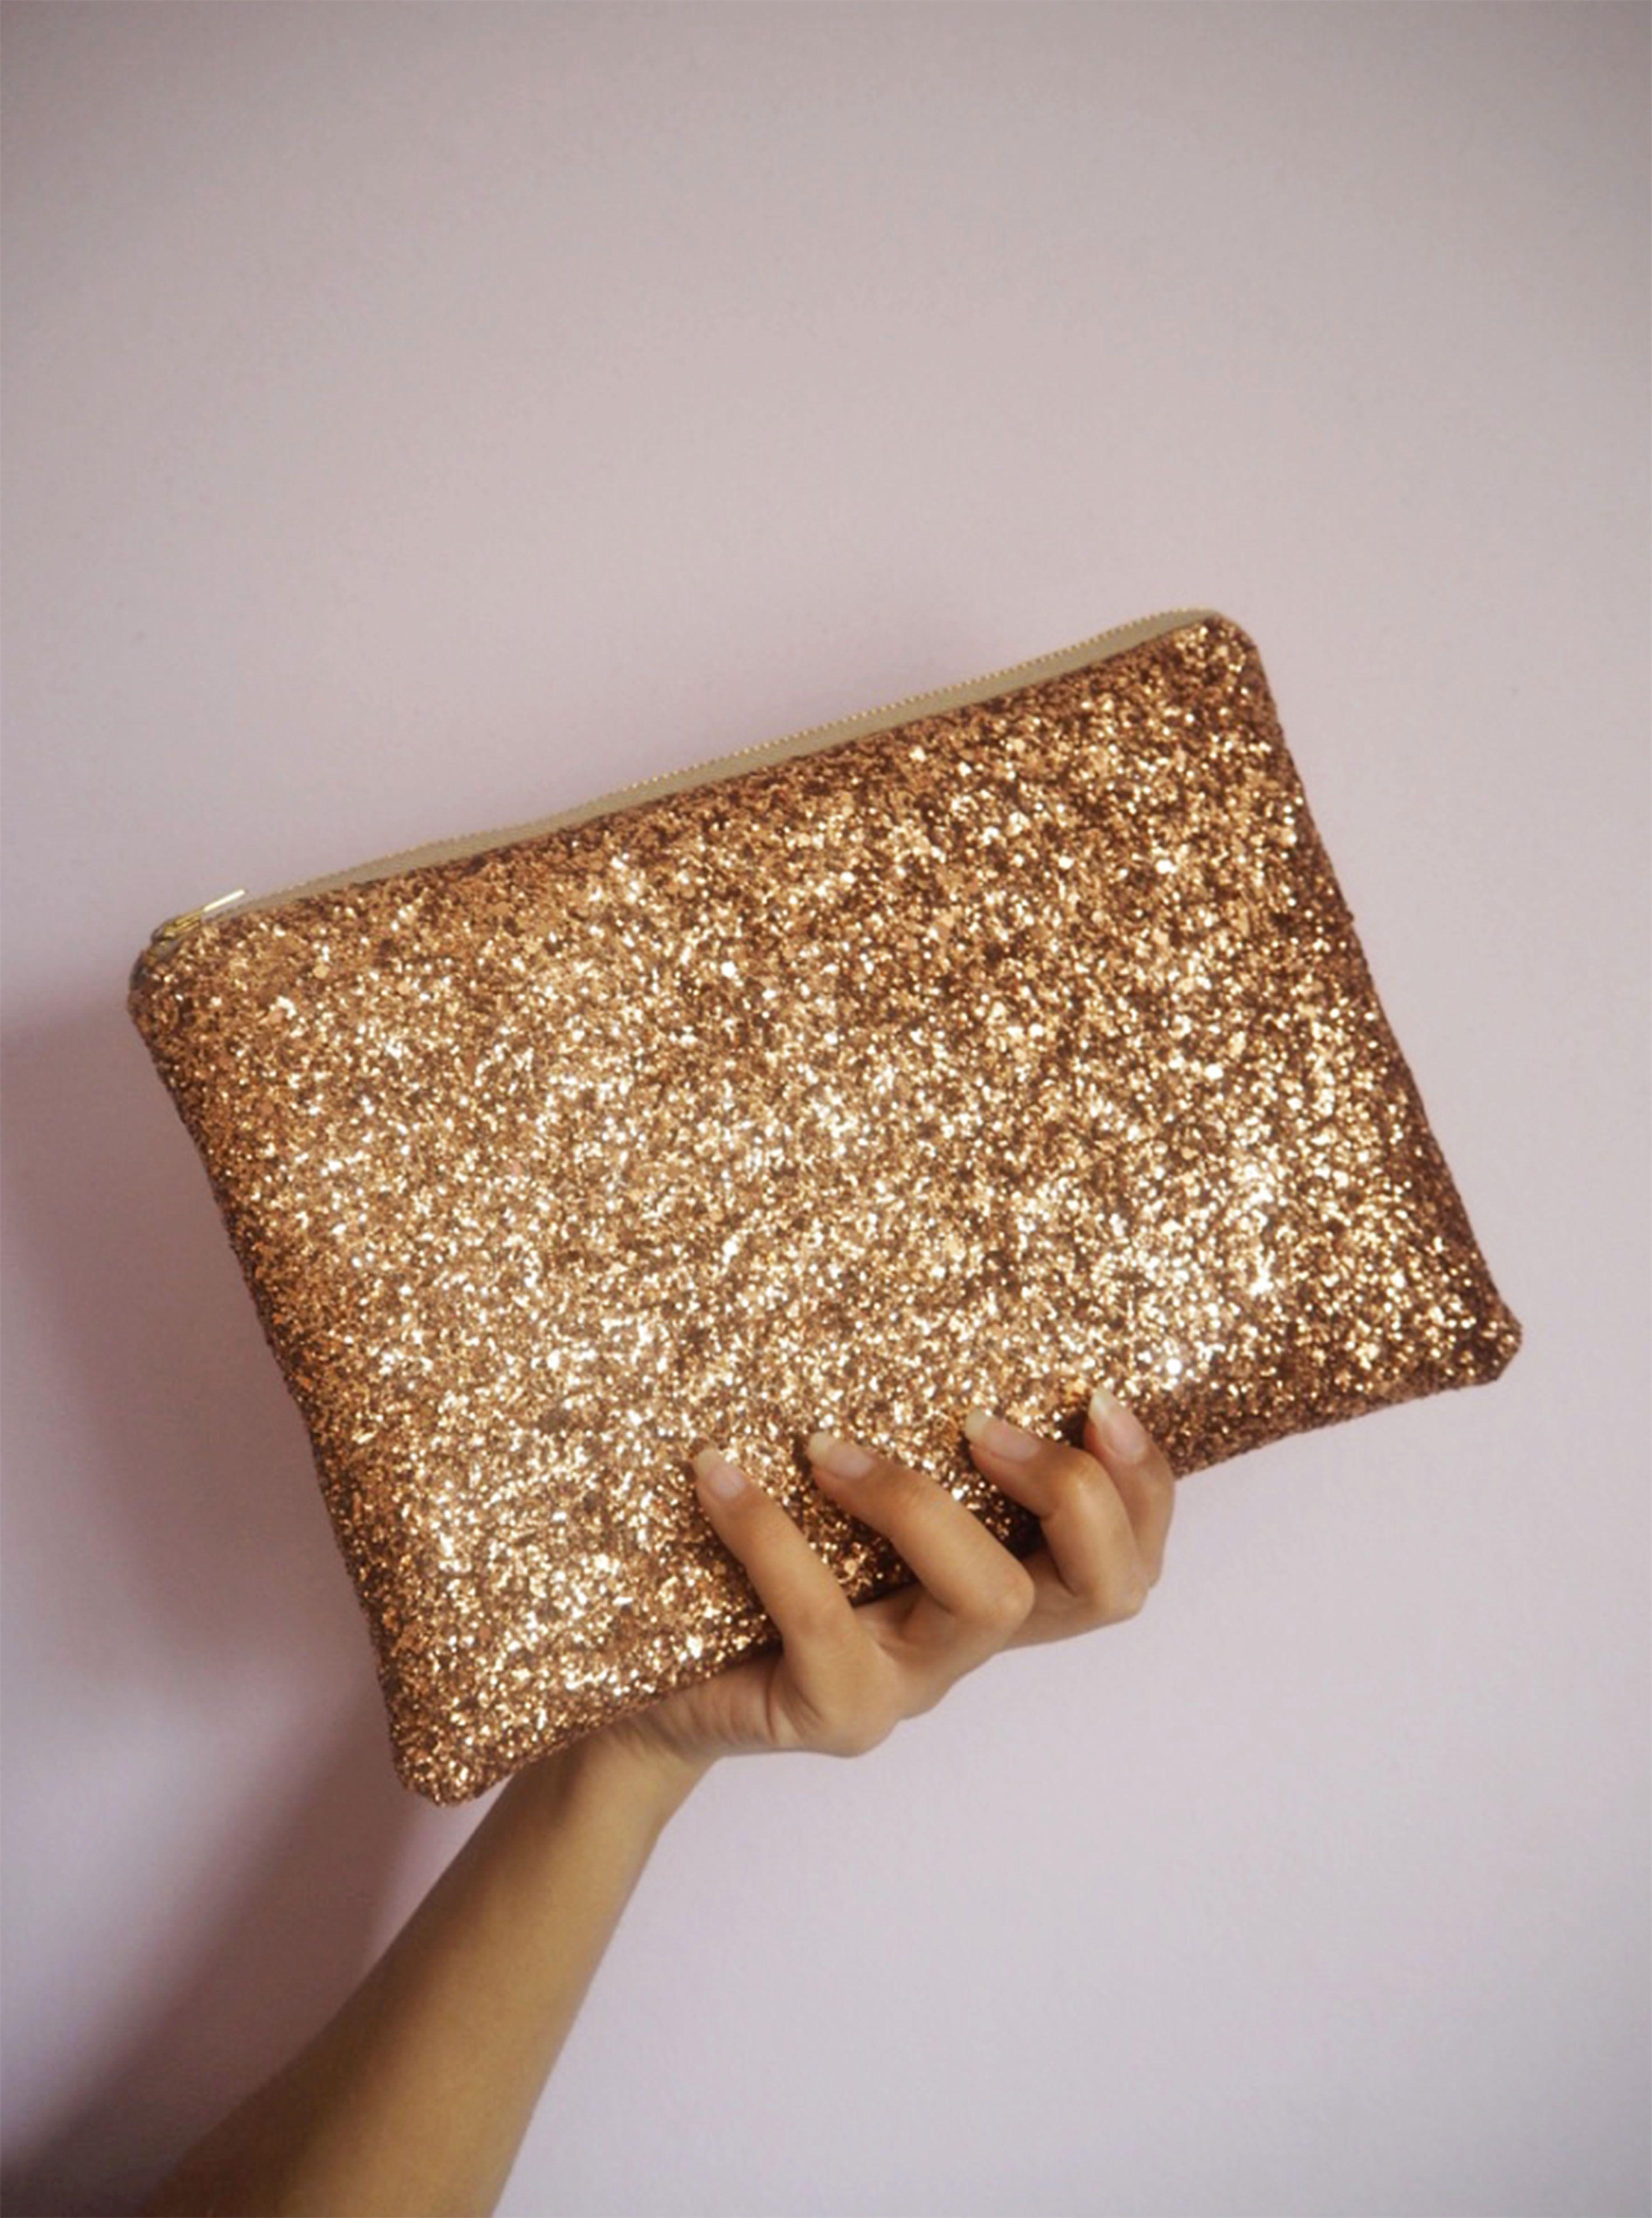 e8c9210e7d9 Rose Gold Glitter Clutch Bag available on https://marketplace.asos.com